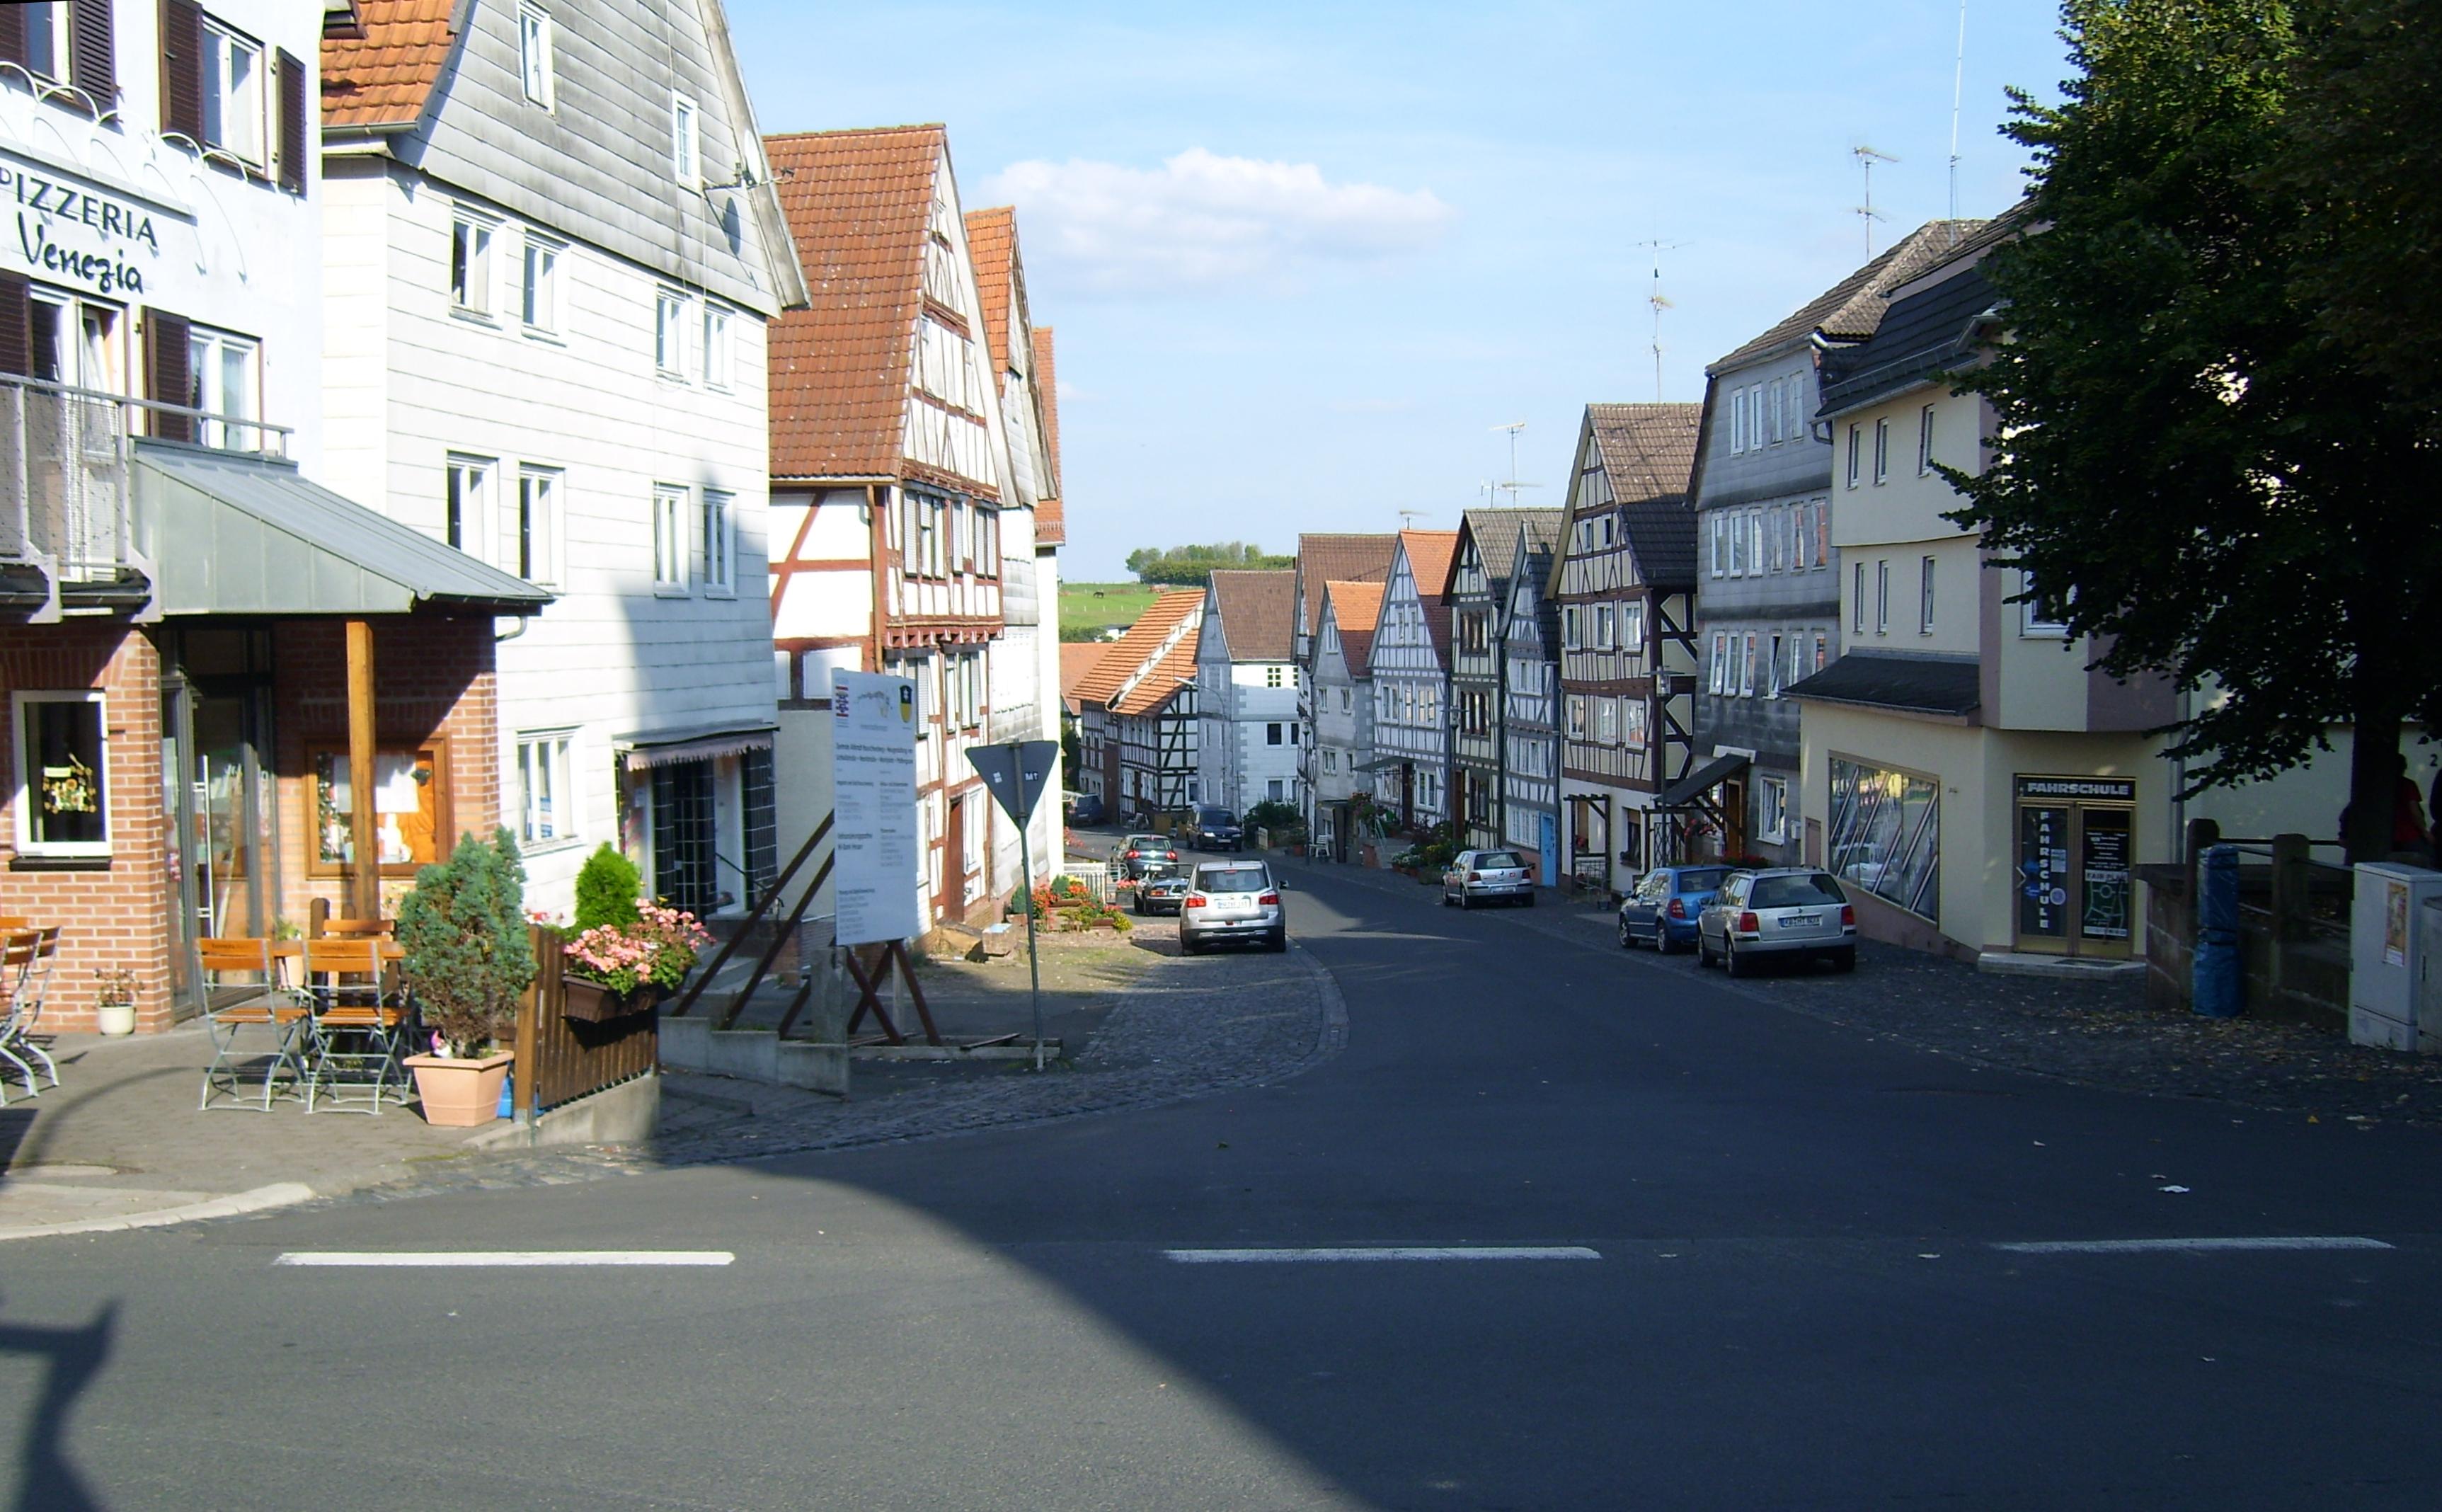 File:Rauschenberg Marktstrasse.jpg - Wikimedia Commons